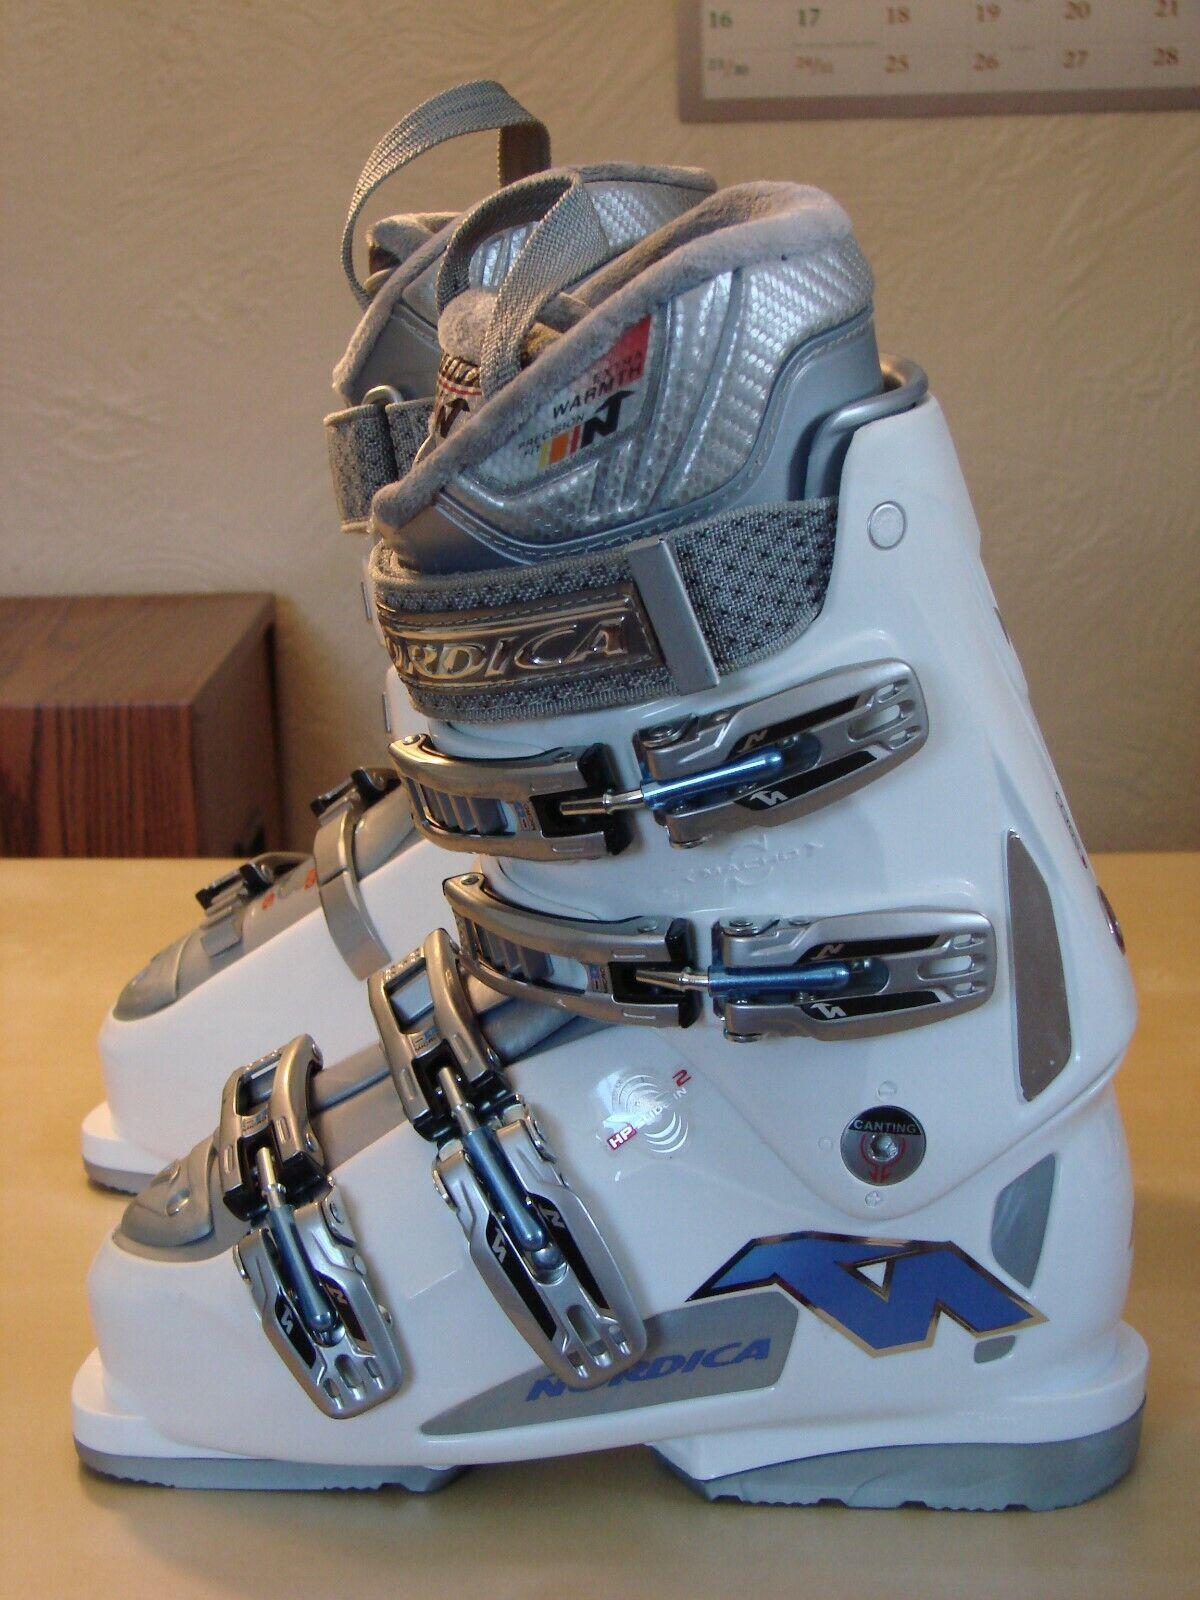 Nordica daSie Noncomfortable 65533; s GTS Alpine Ski Stiefel Größe 6.5 US   23.5 MP